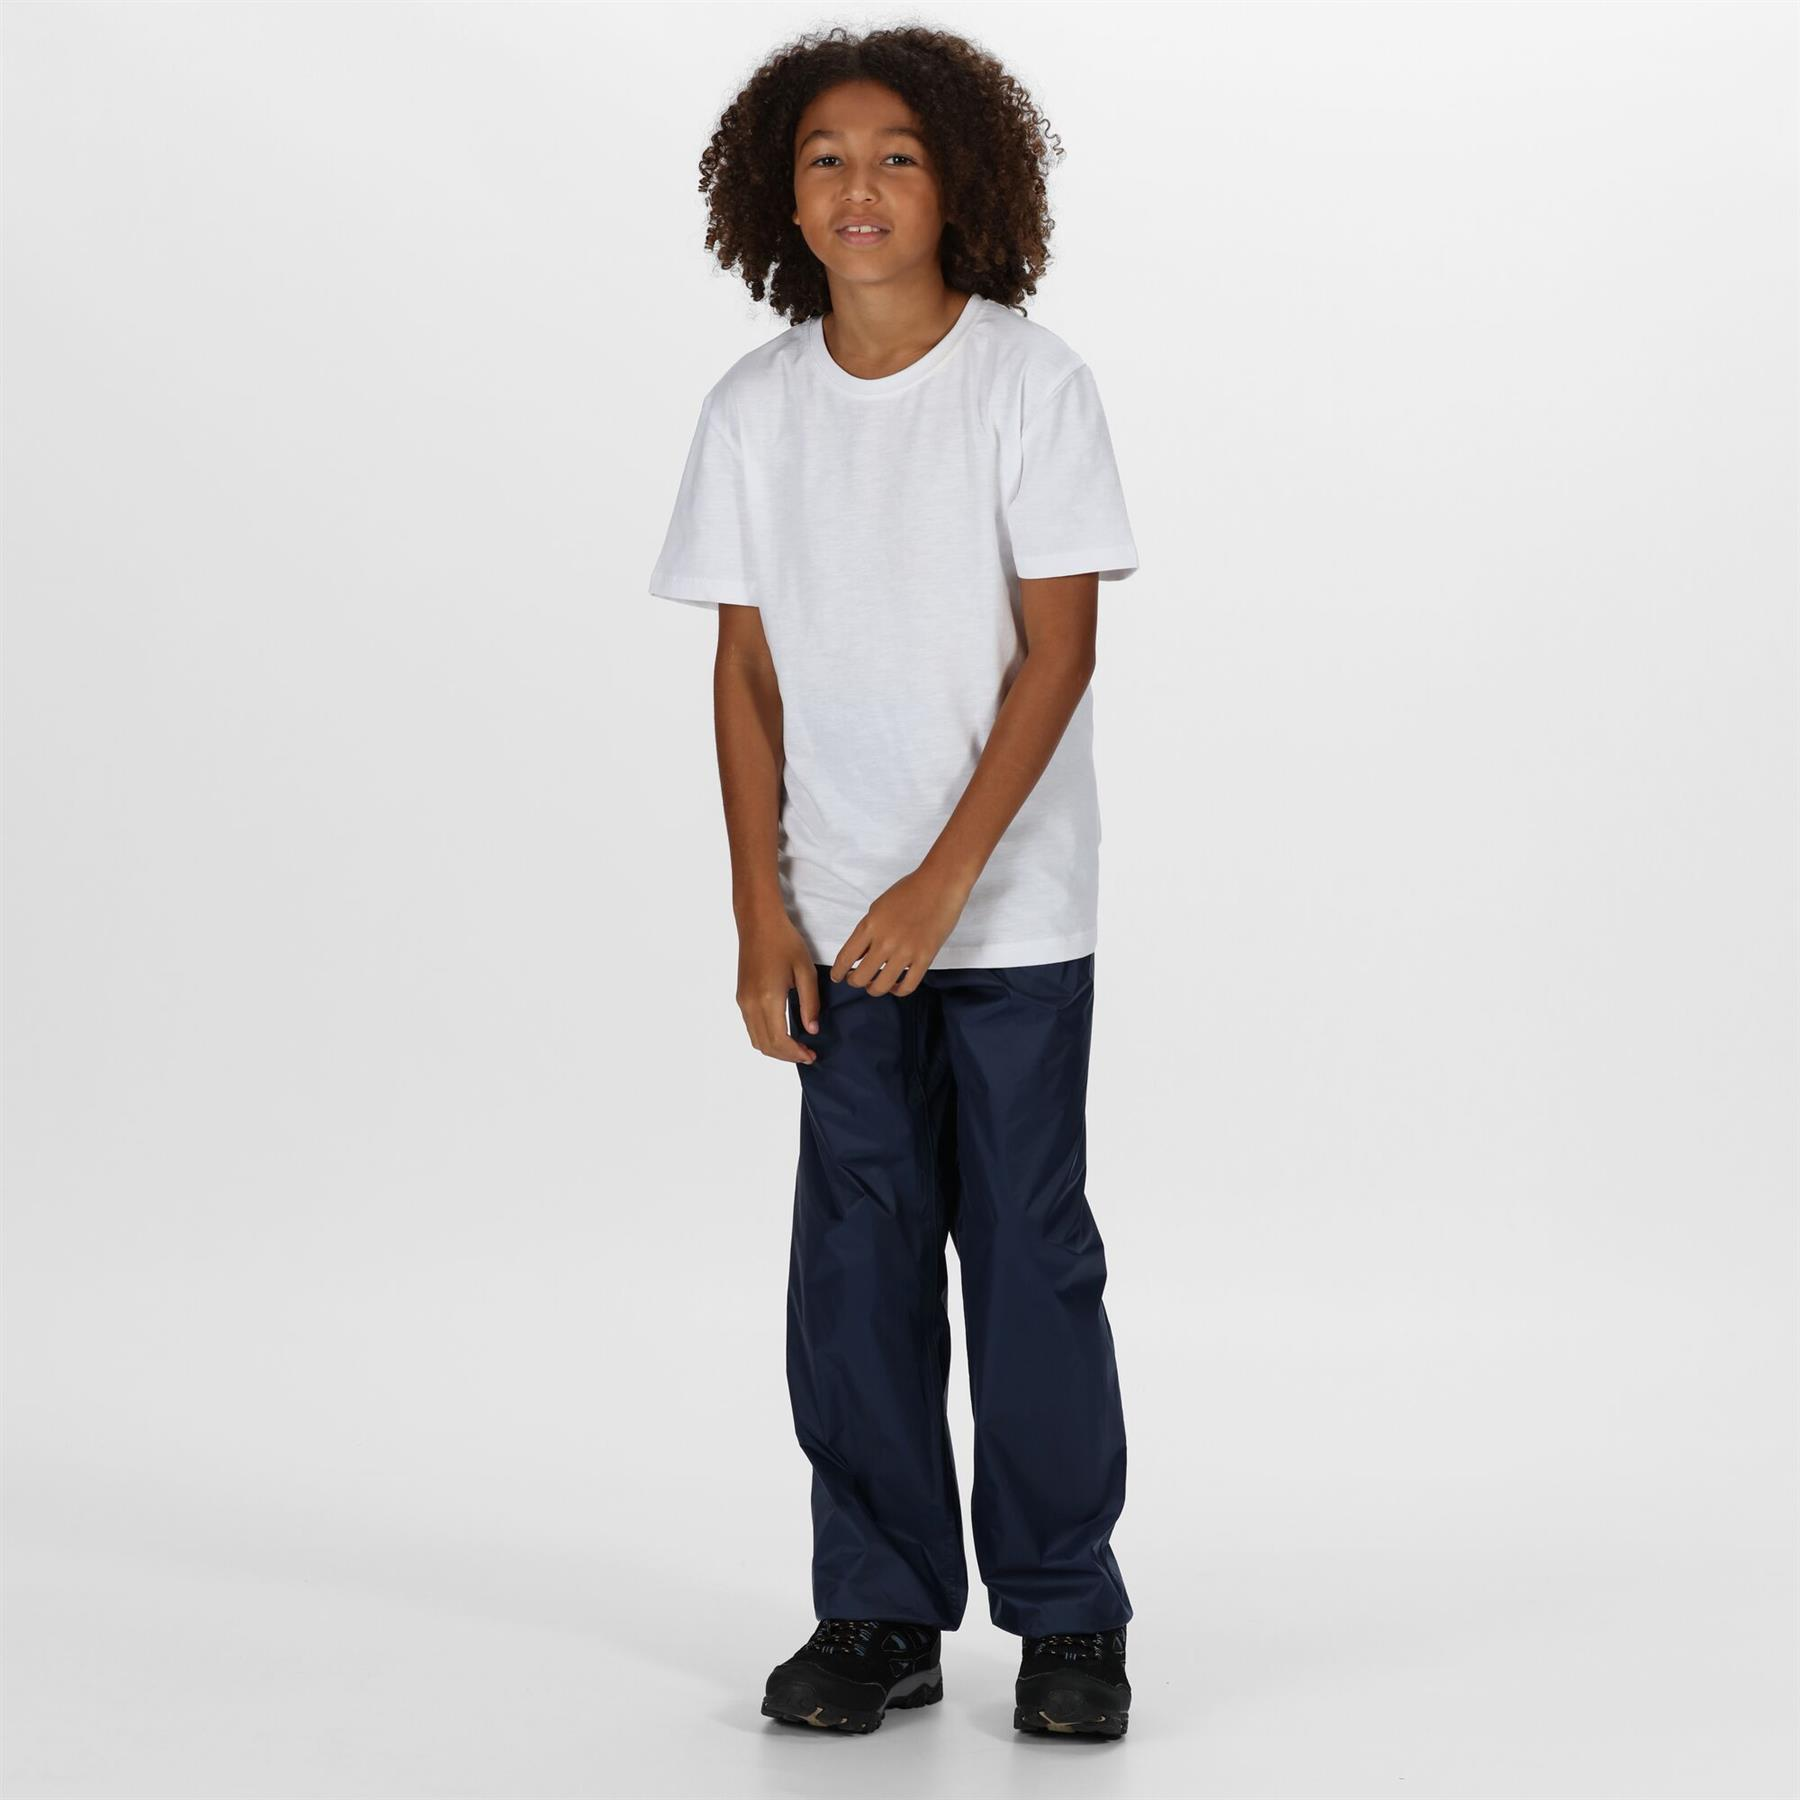 miniatuur 10 - Regatta Kids Pack It Waterproof Packable Overtrousers Boys Girls Trousers